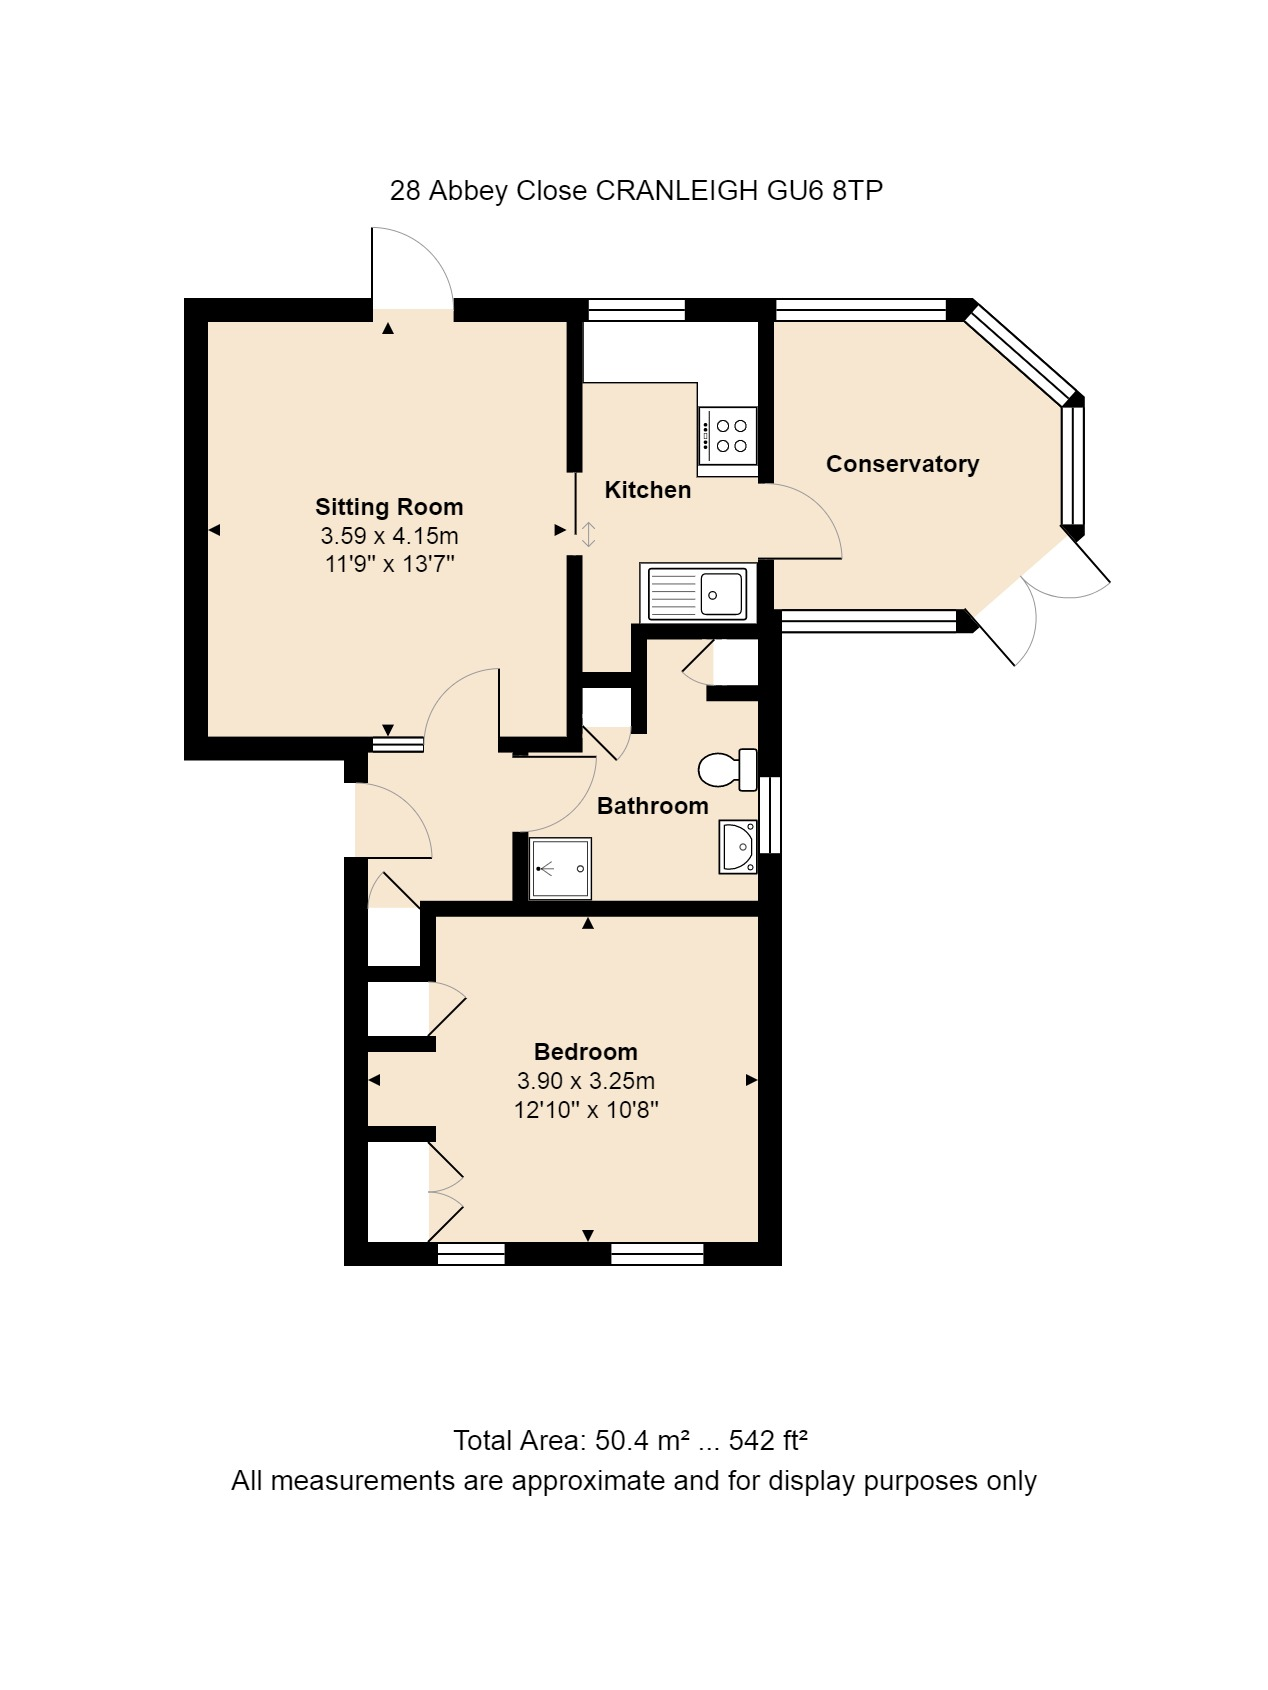 28 Abbey Close Floorplan